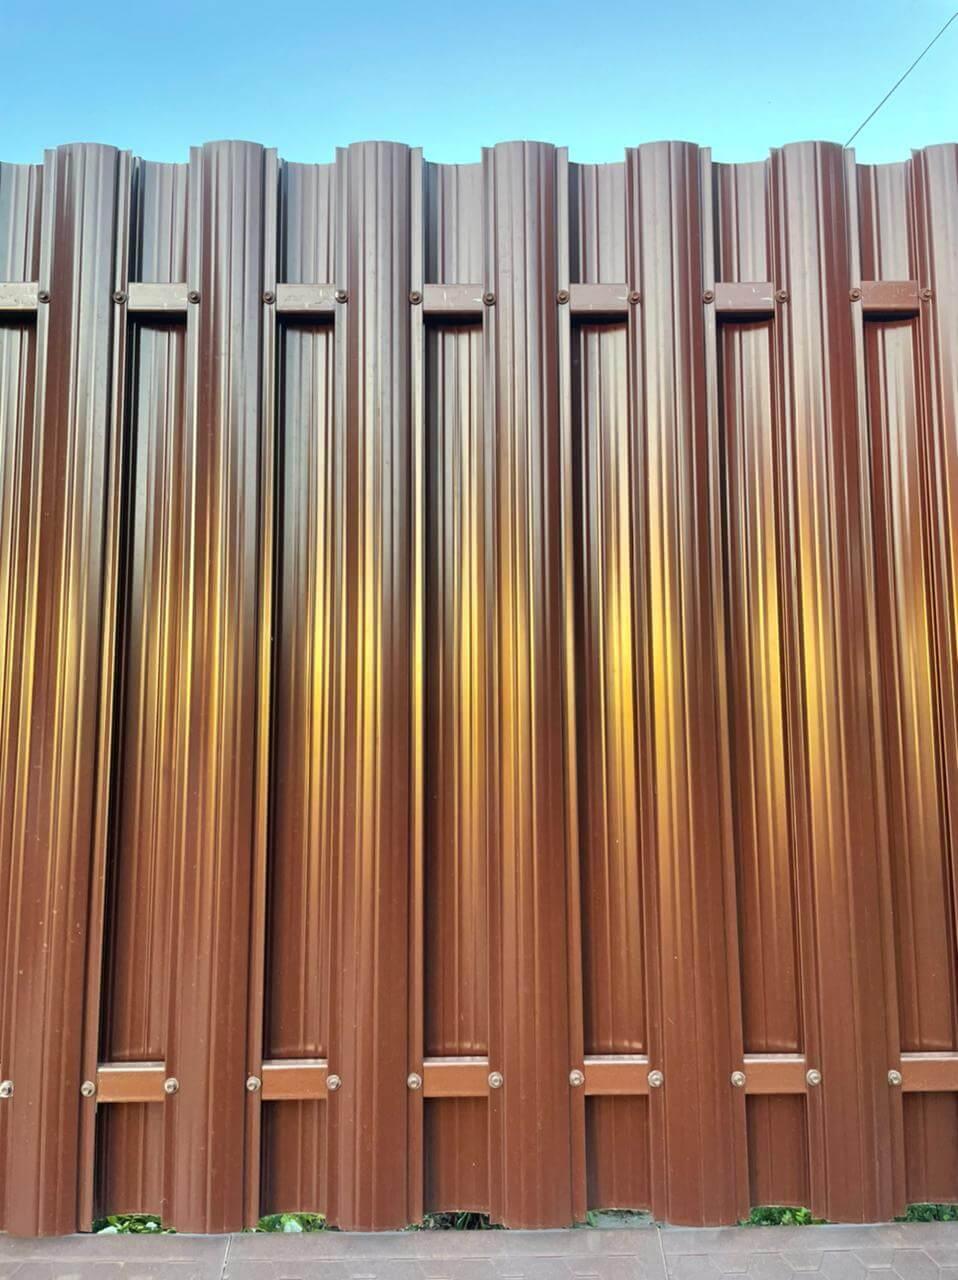 забор из штакетника шоколад двухсторонний фото4